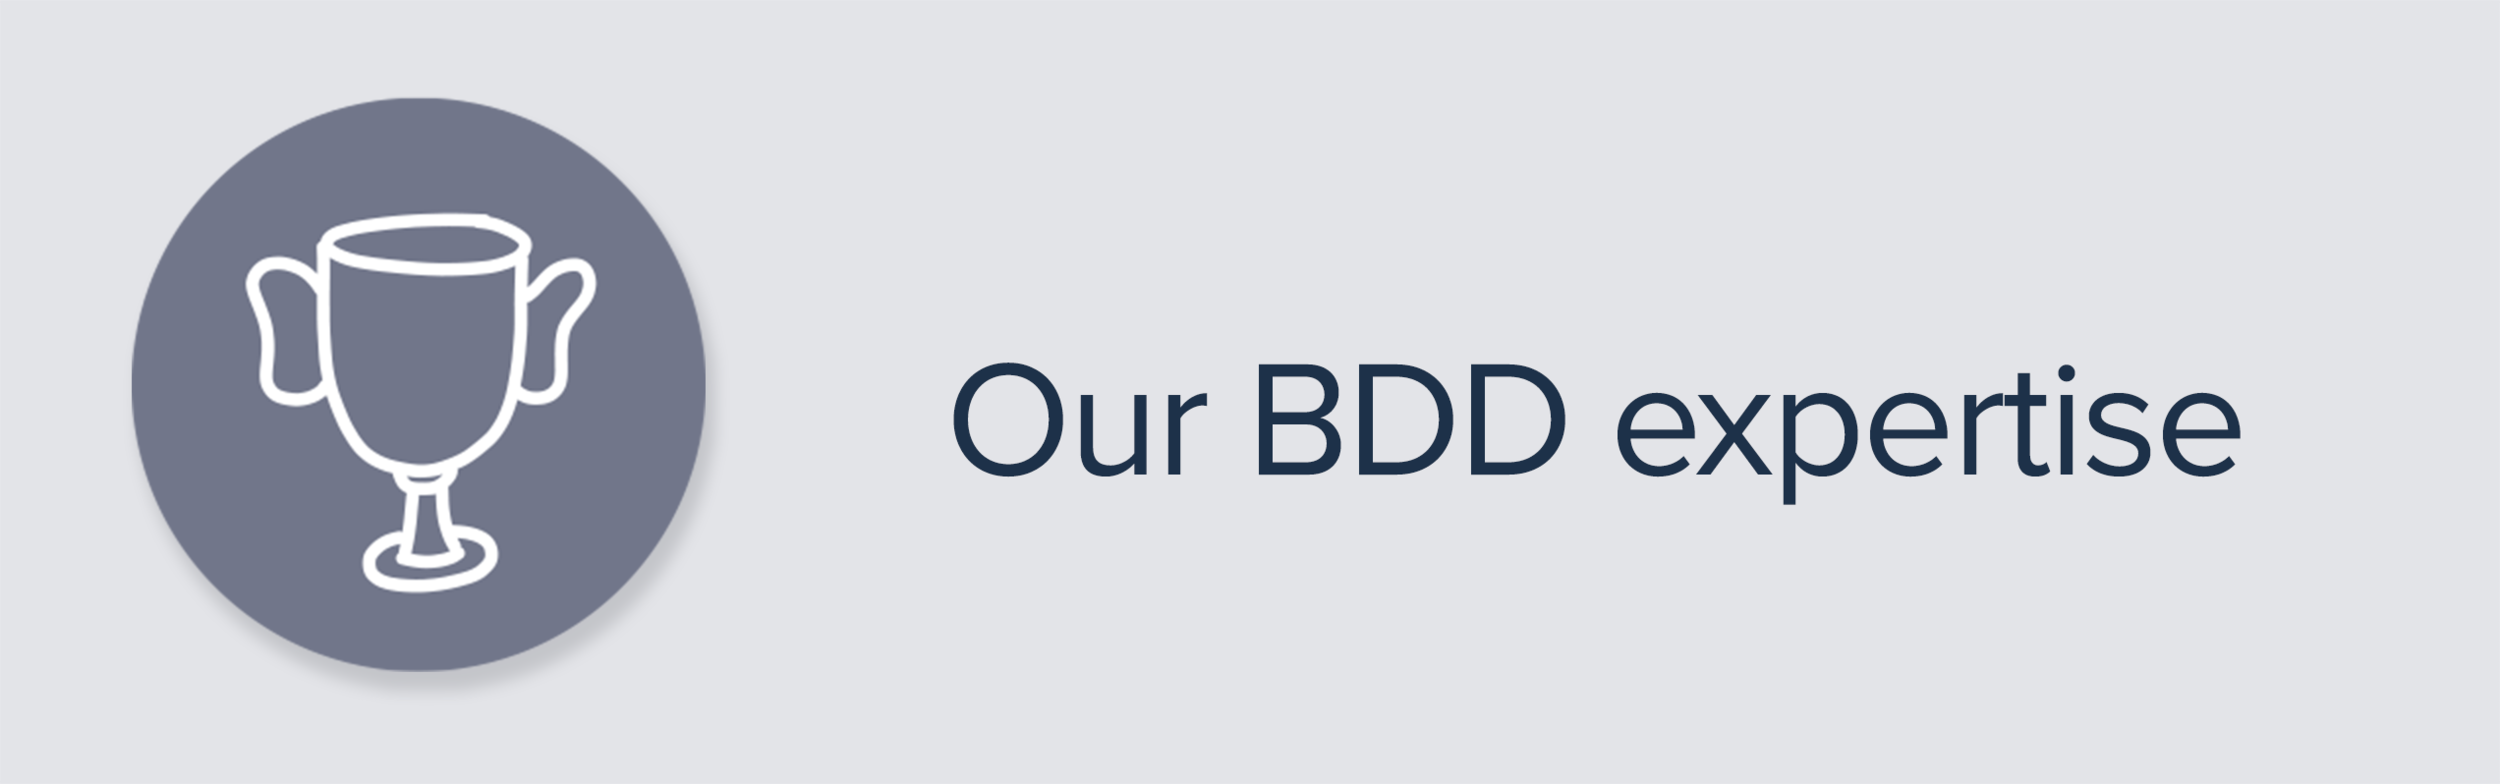 Our BDD expertise - cucumber tutorial - cucumber software